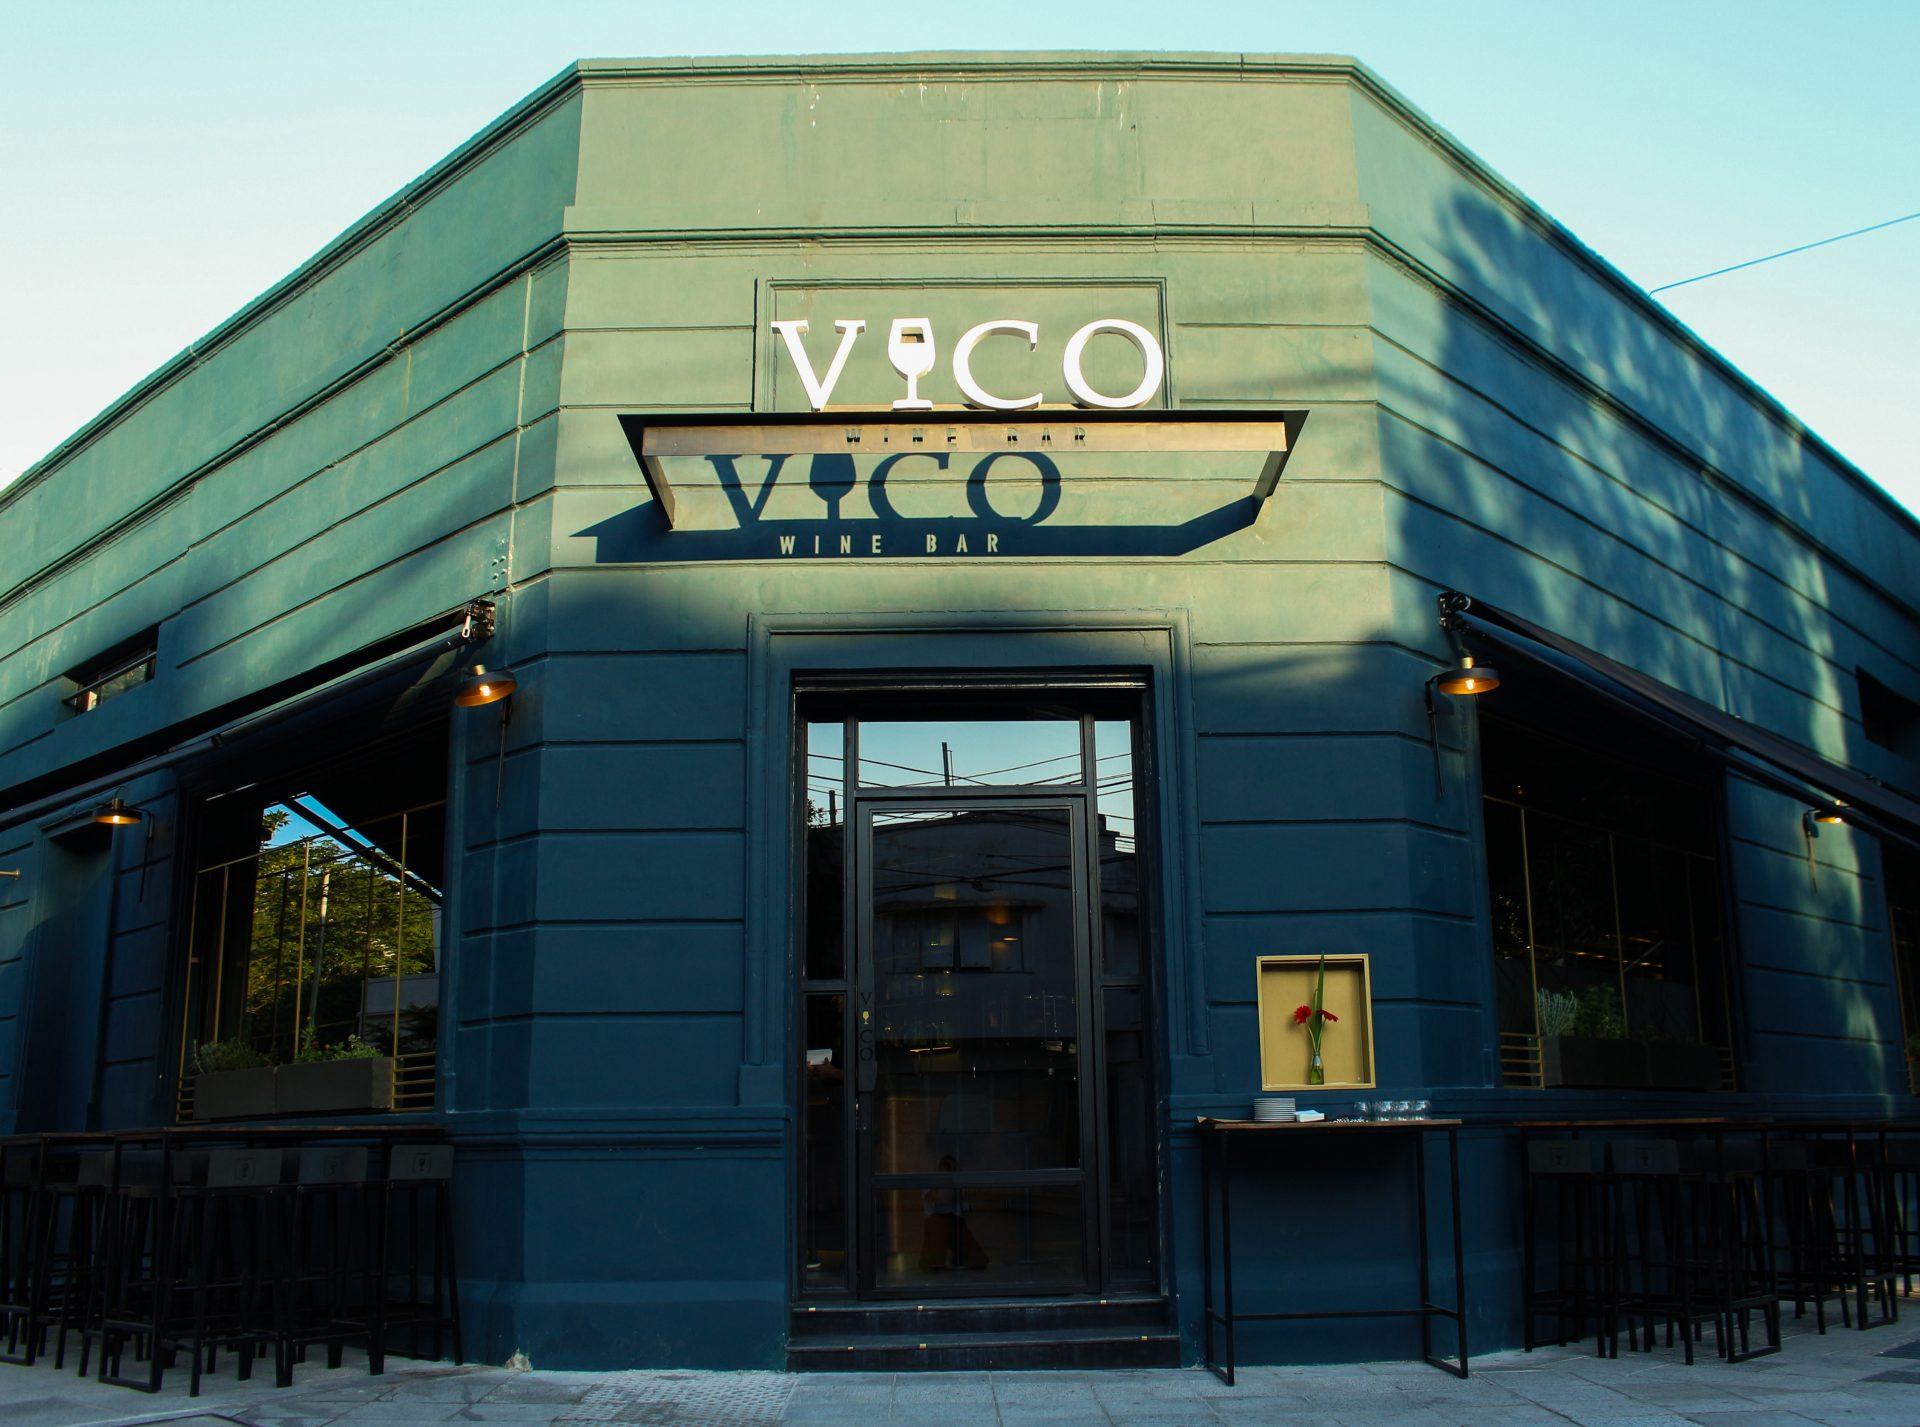 Frente del bar Vico Palermo.